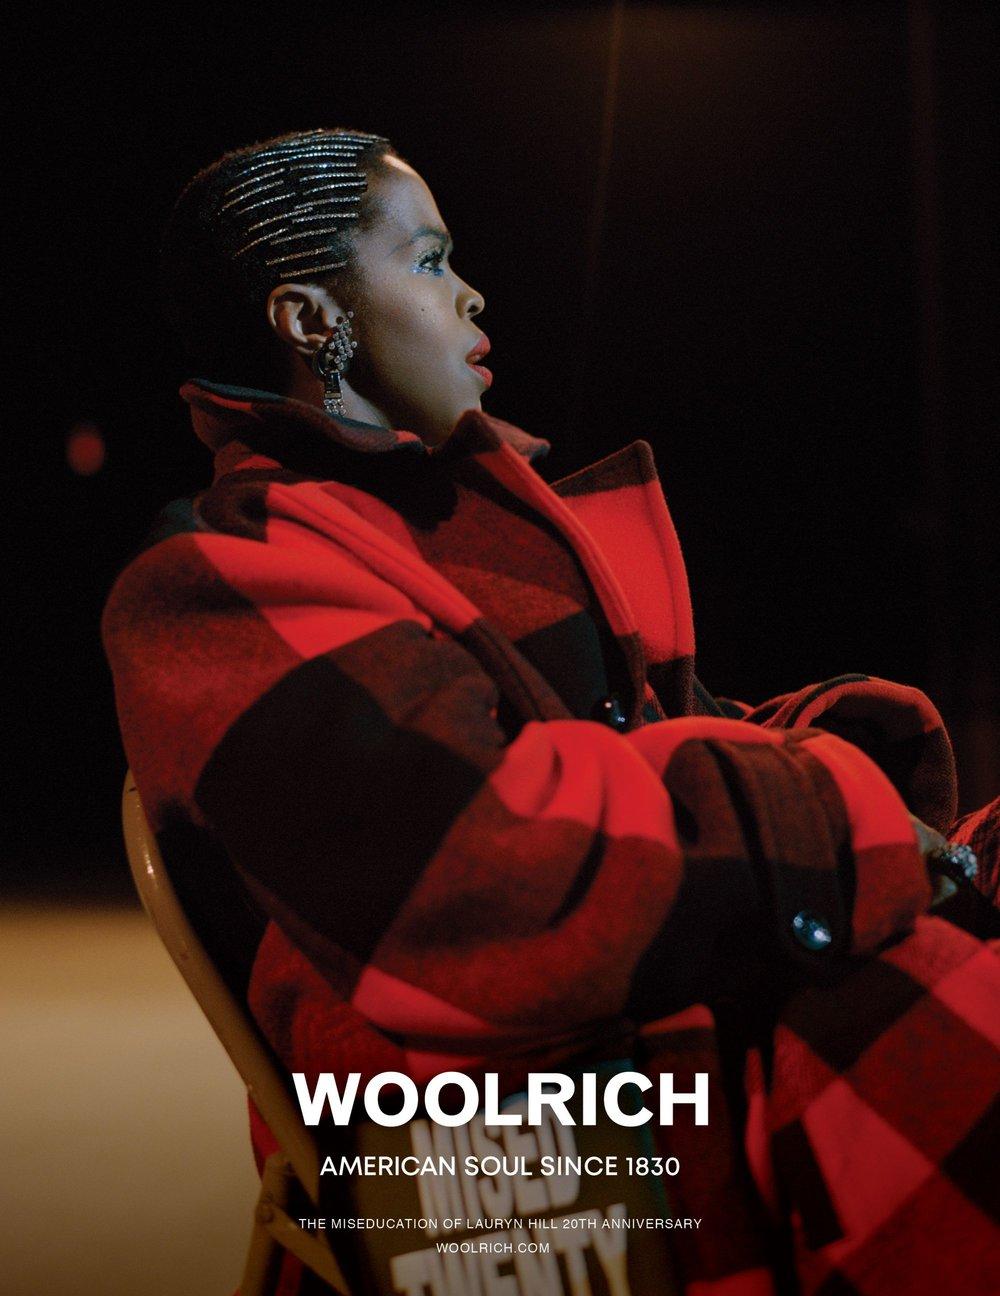 Woolrich-FW-18-ADV-Campaign-6.jpg